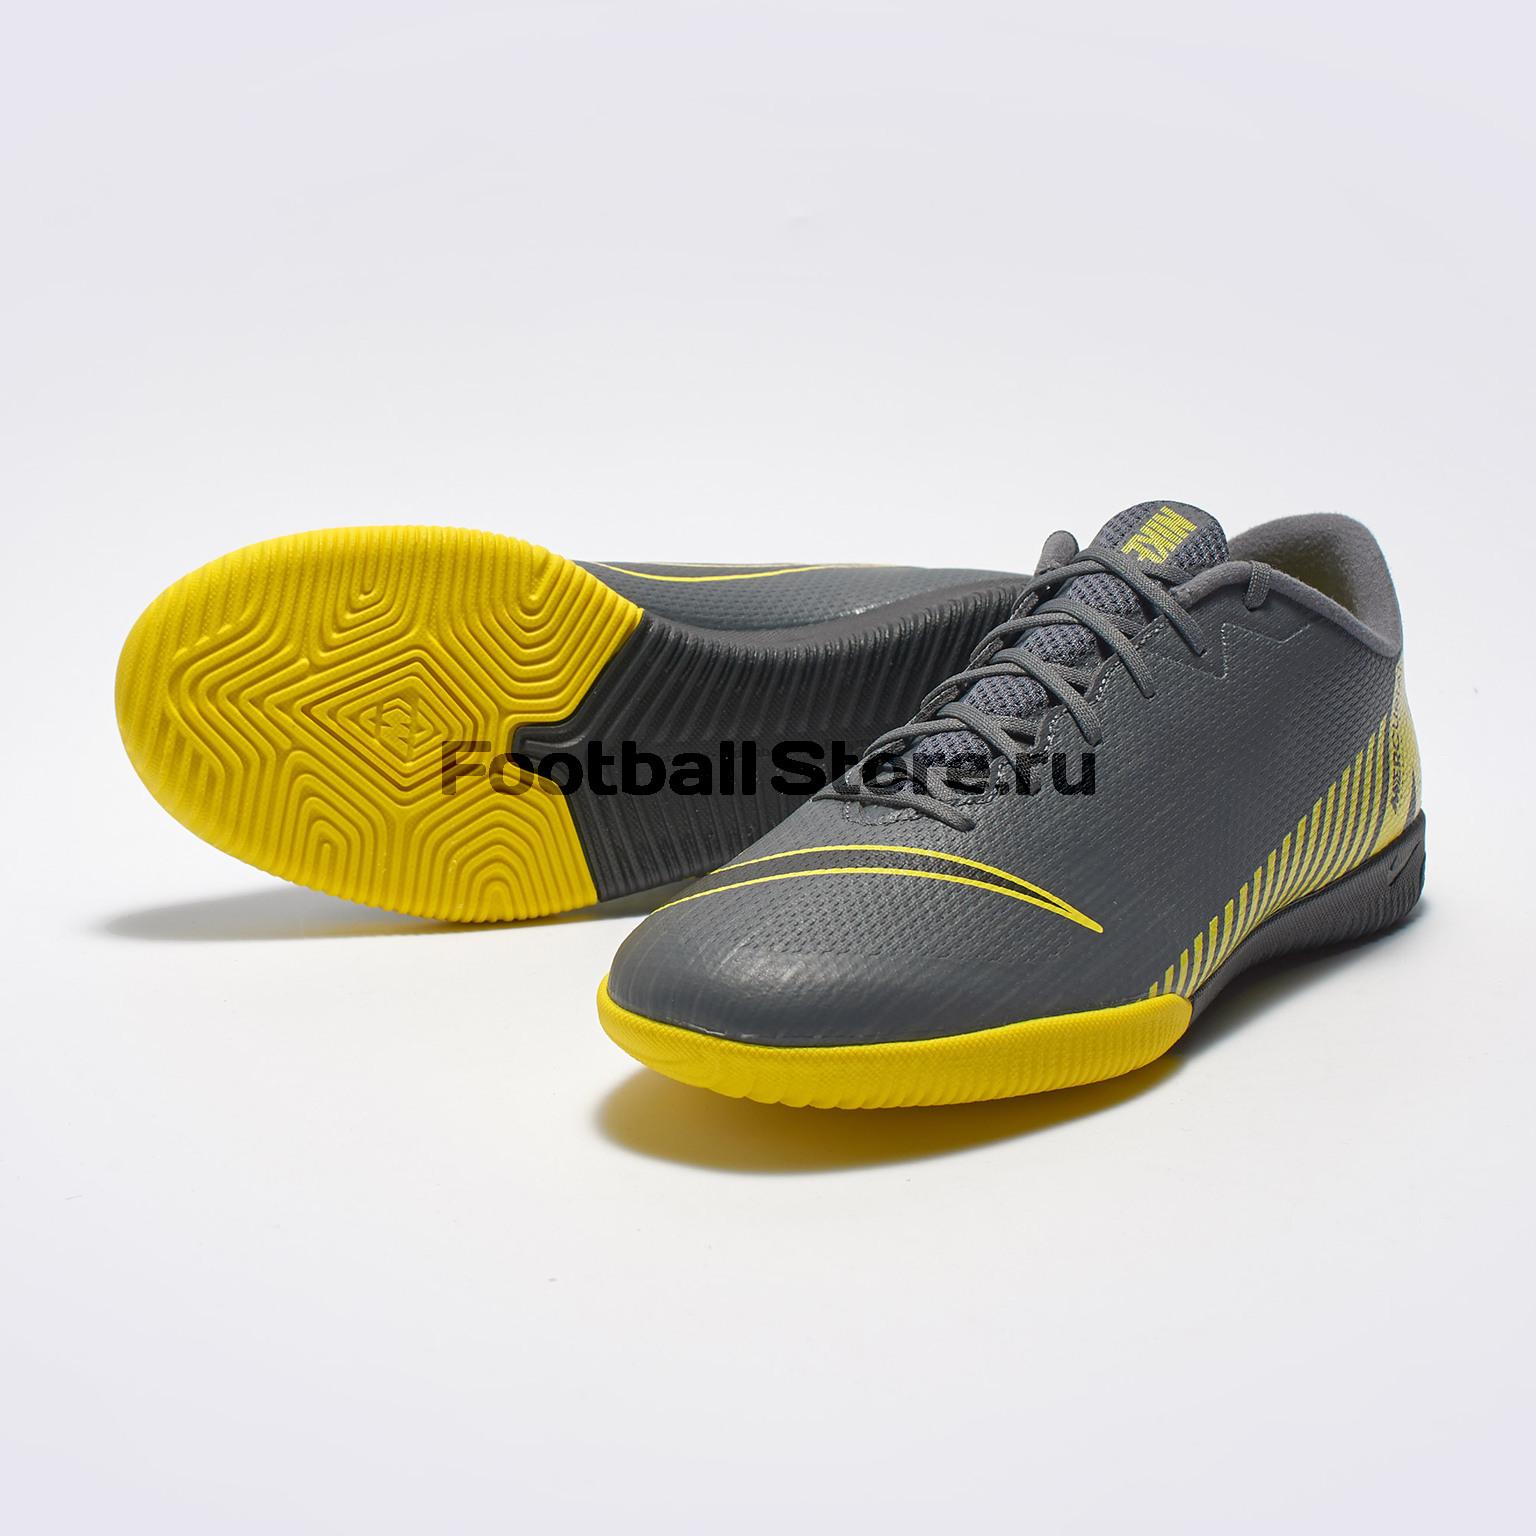 Футзалки Nike Vapor 12 Academy IC AH7383-070